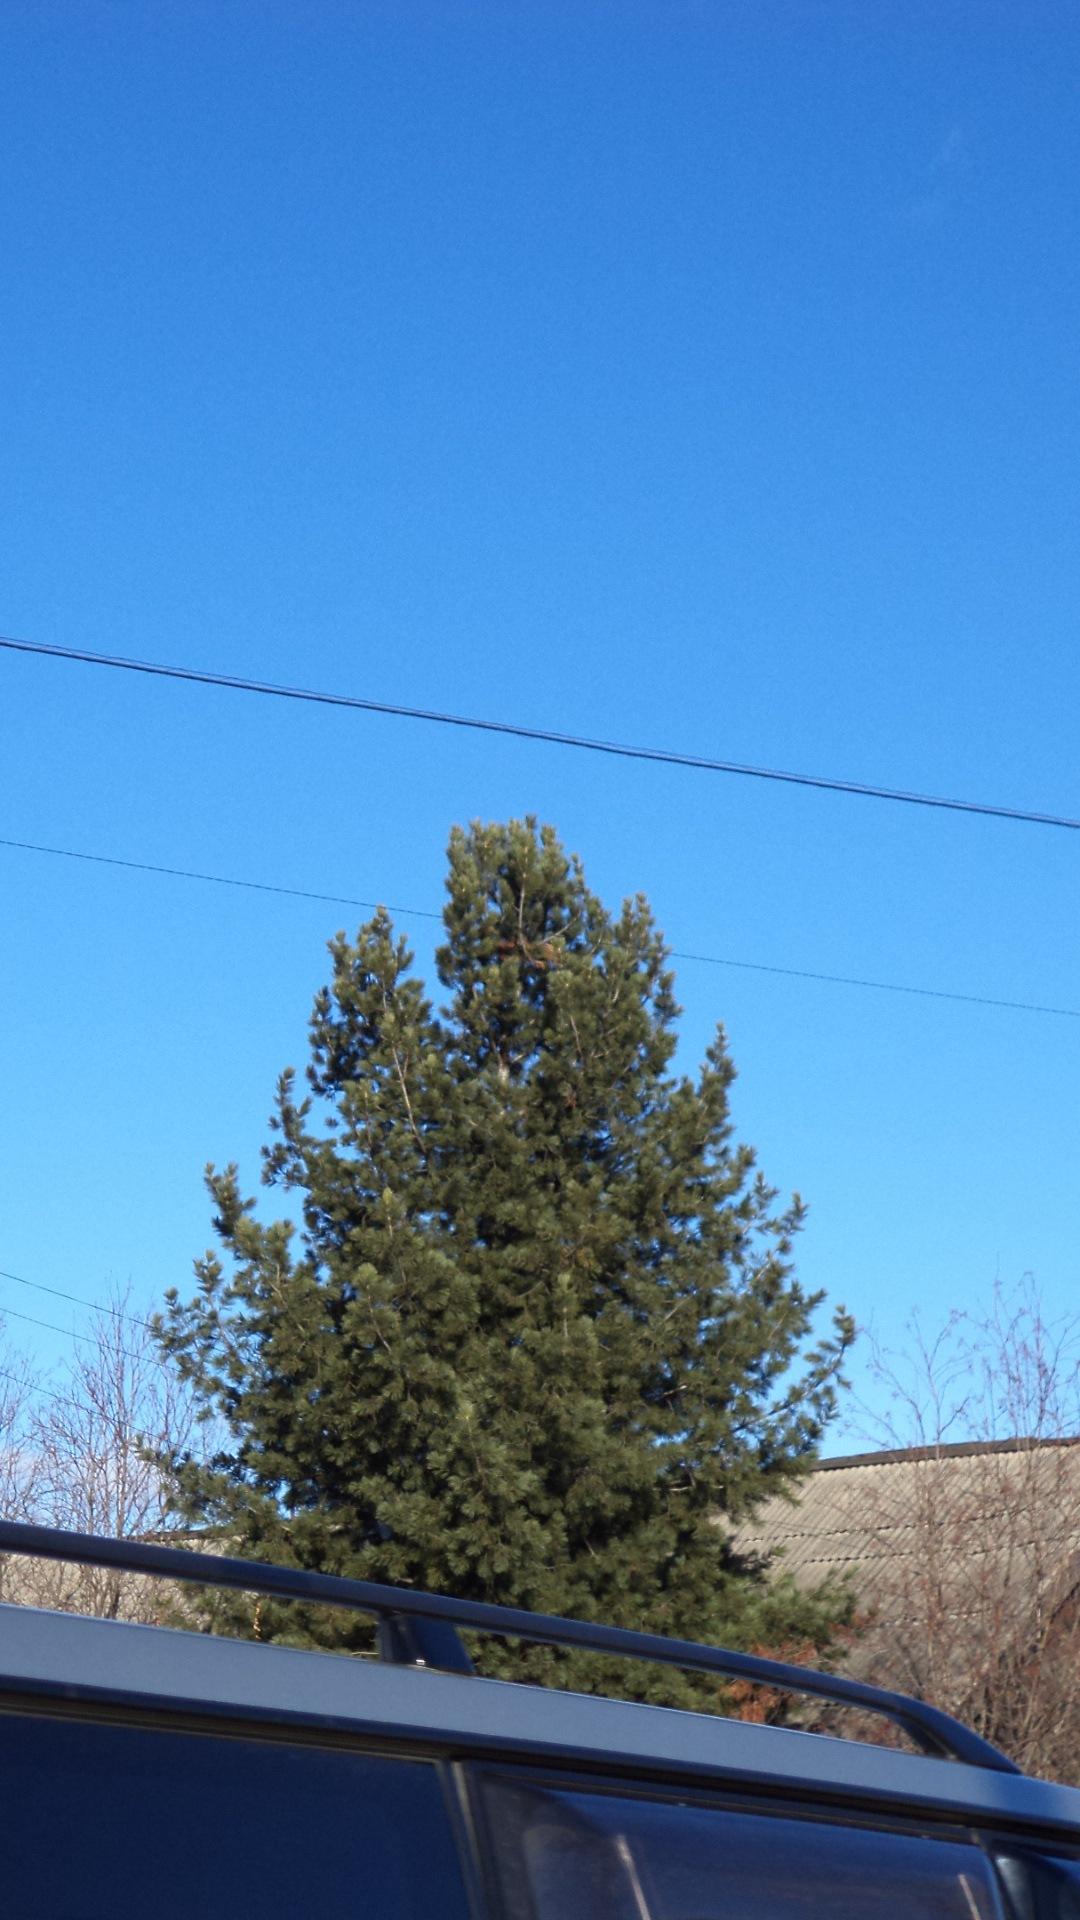 кедры в якутском Алдане прямо у домов! by Anzhelika Struchkova